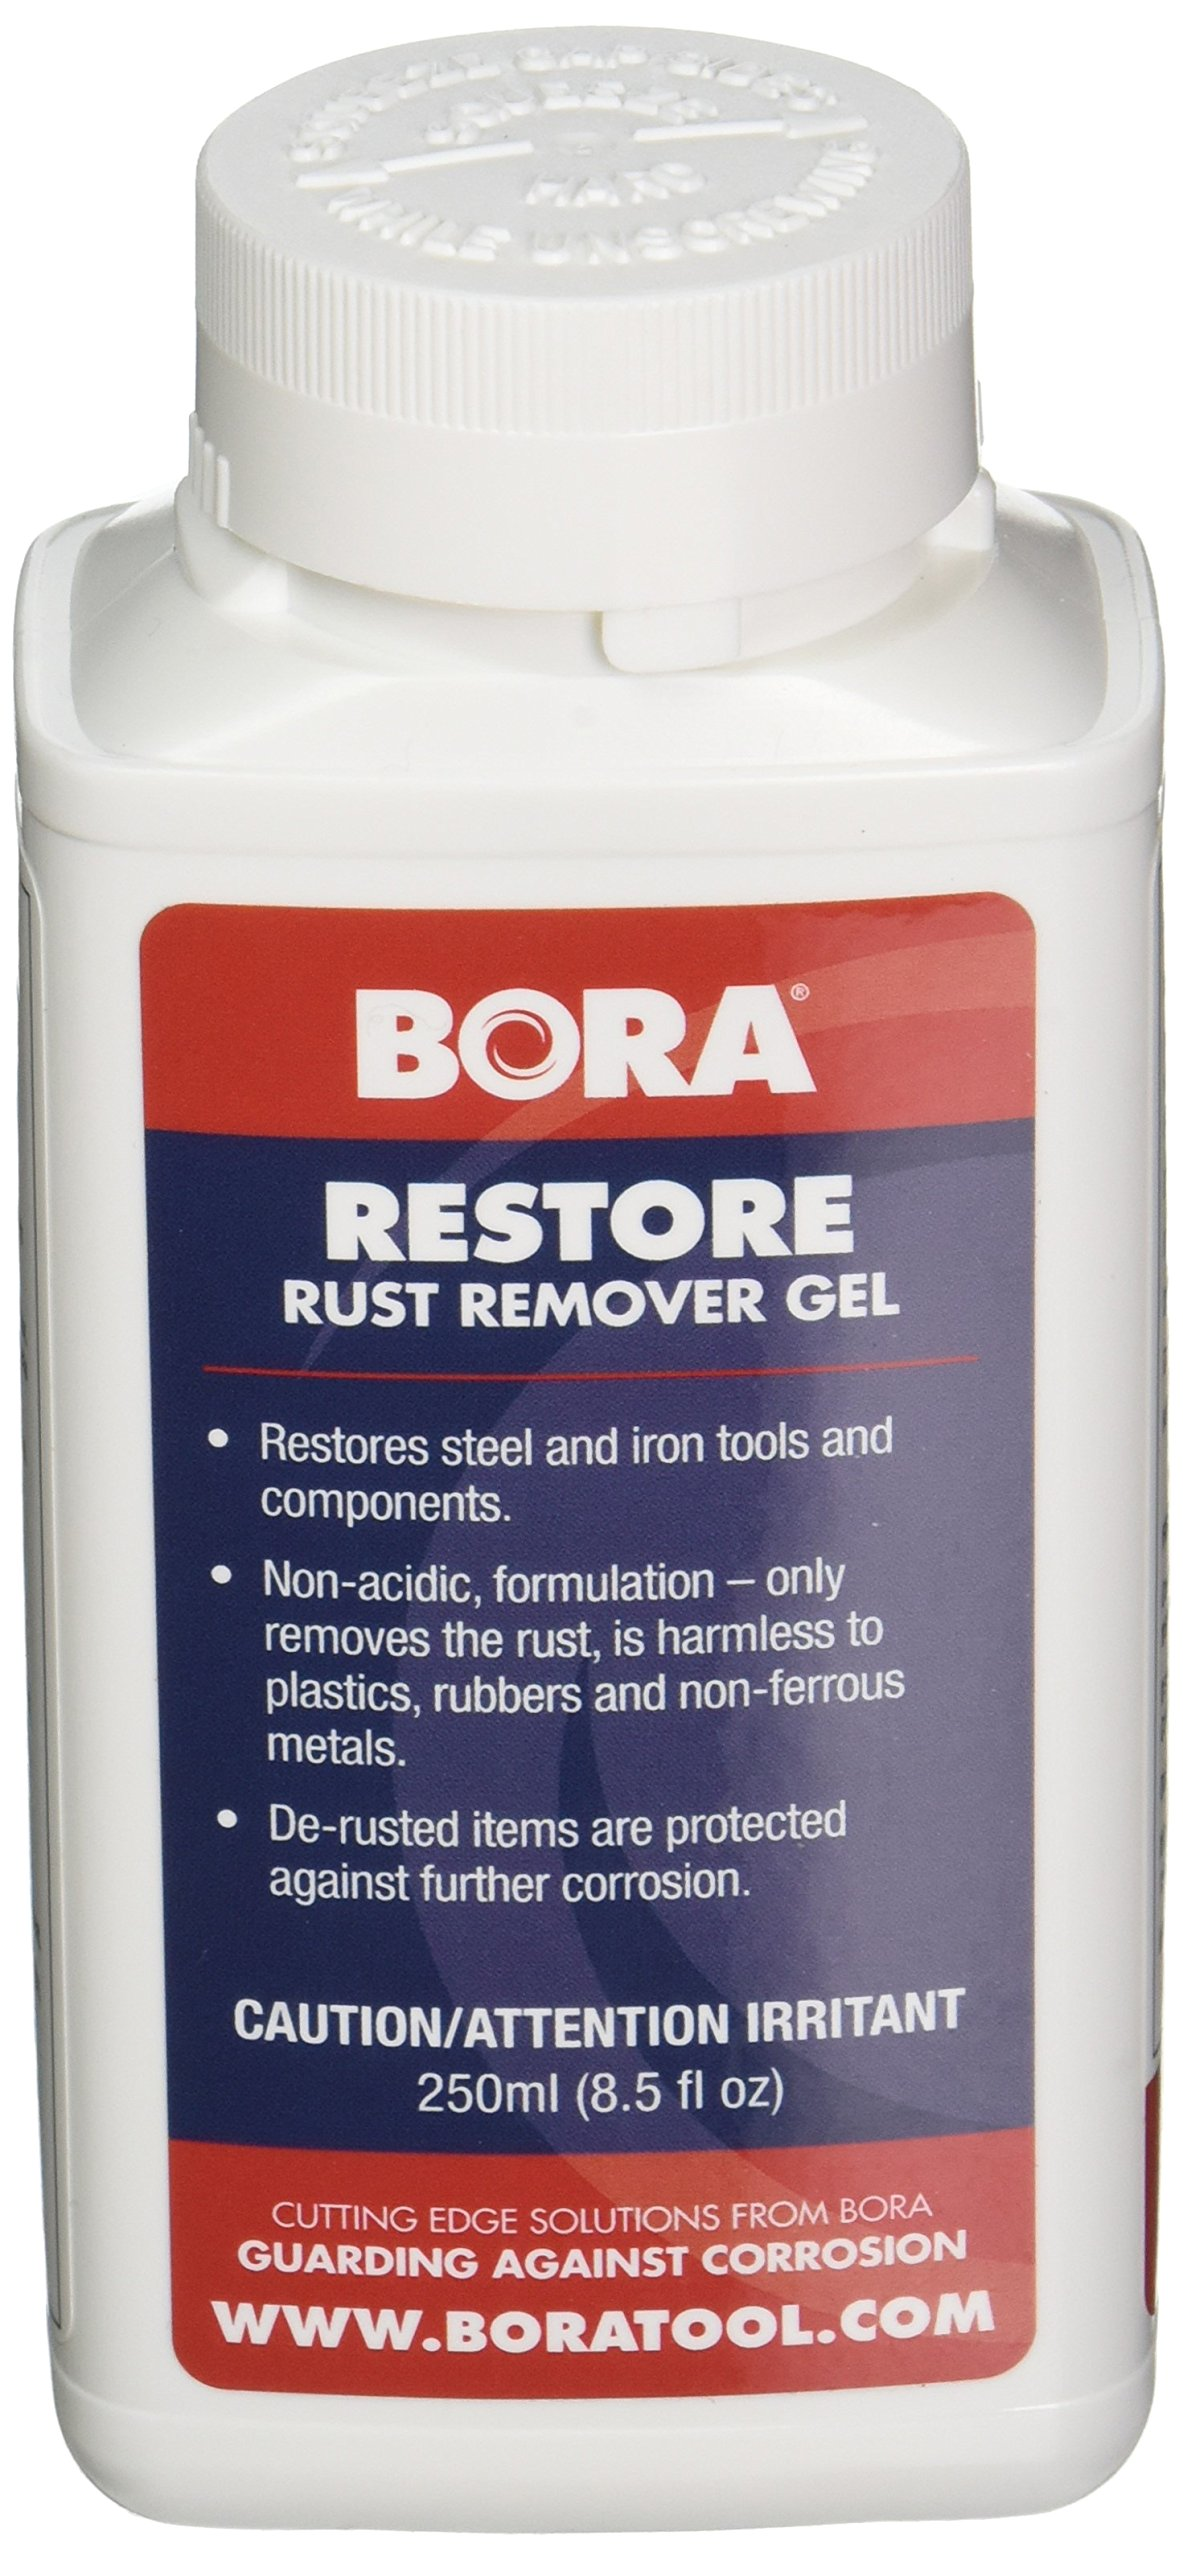 Restore Rust Remover Gel Bora STN-RRG250 250ml. Combines the Power of Restore Non-Acidic Rust Remover in a Convenient-to-Use Gel